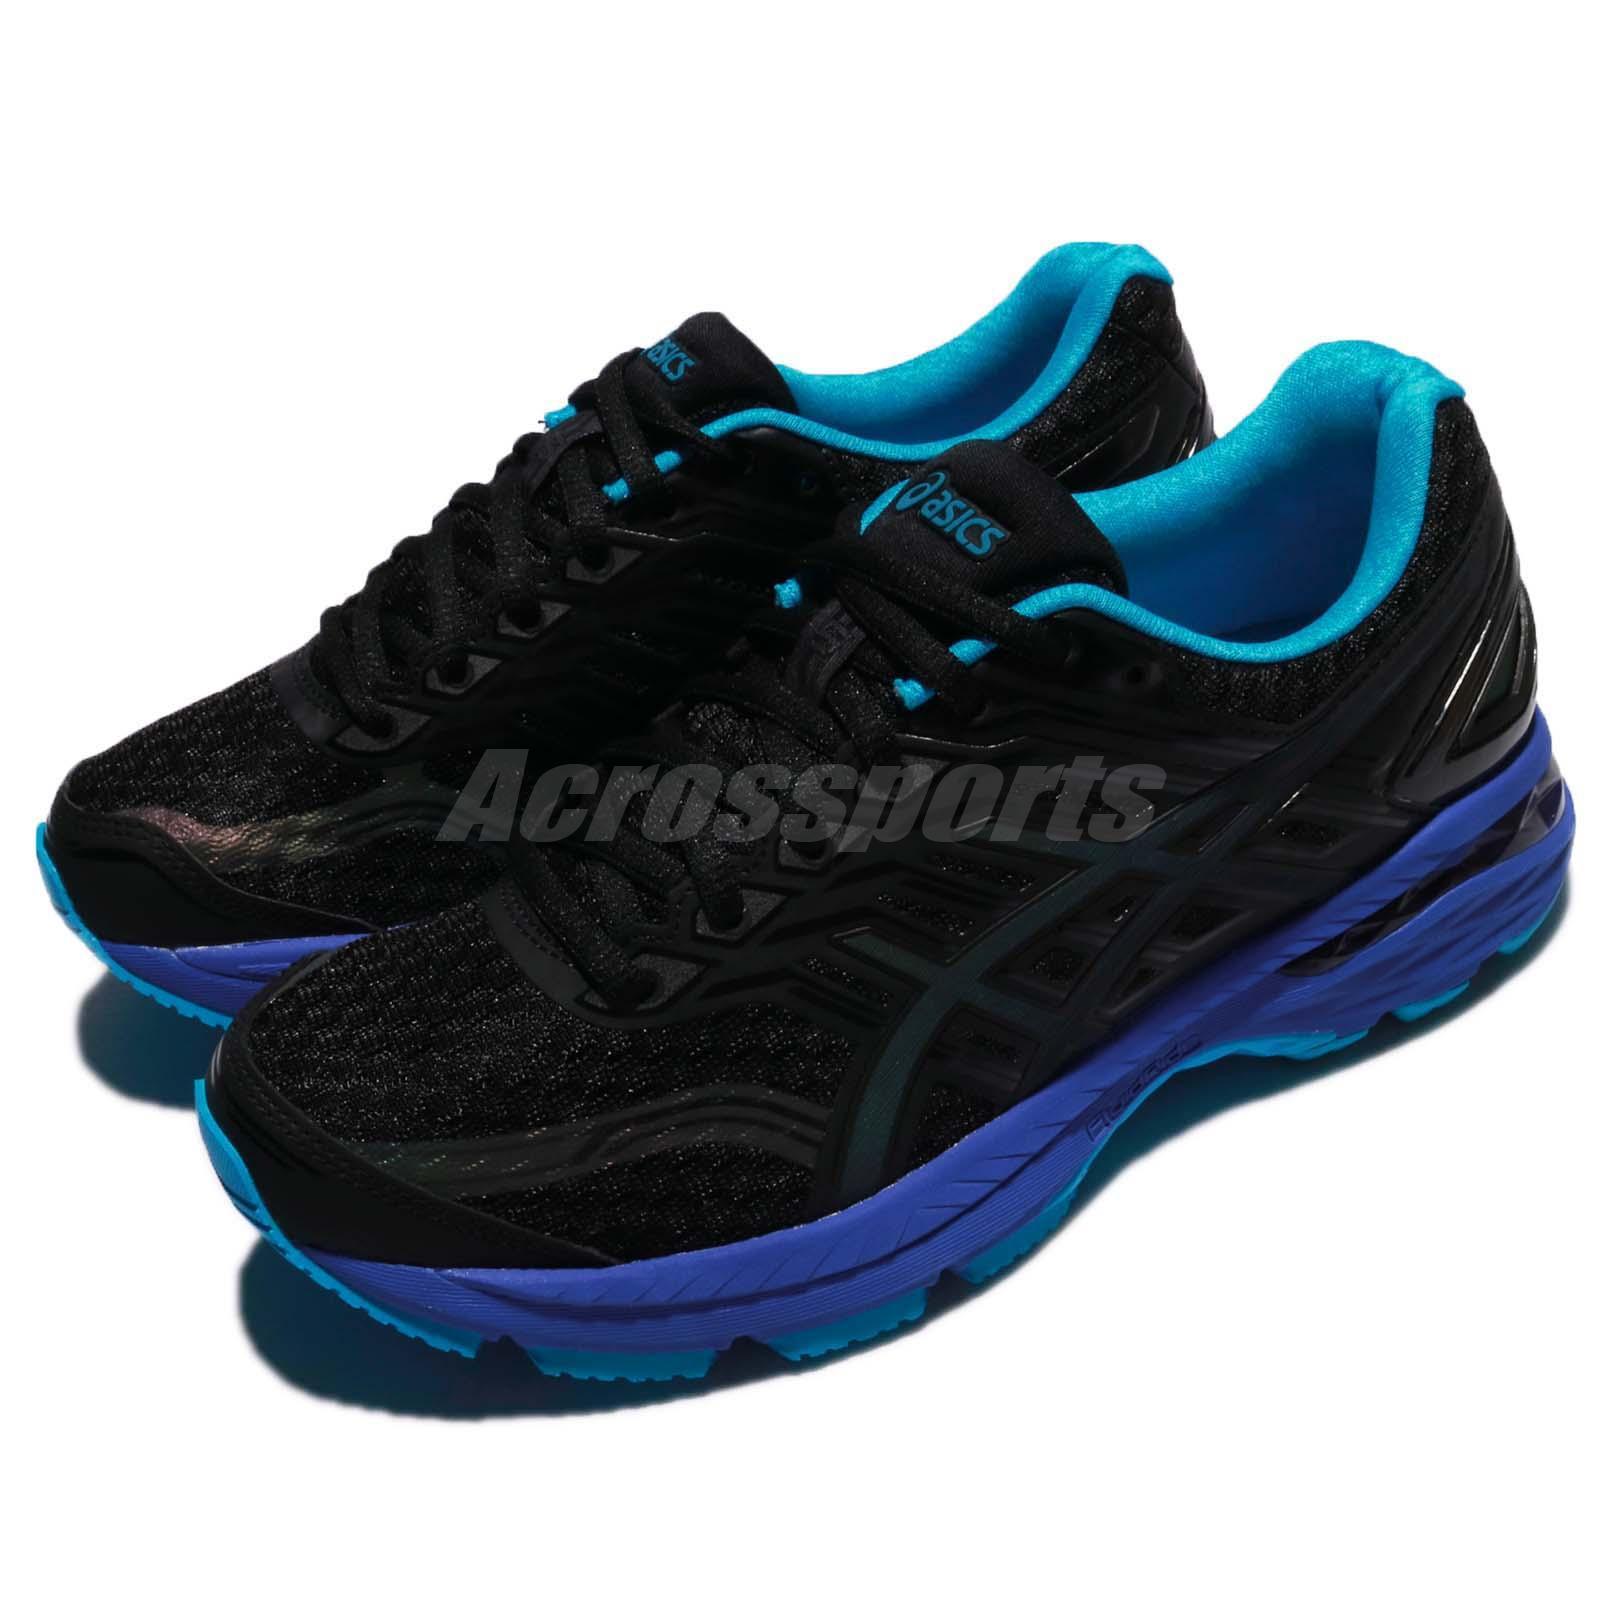 Details about Asics GT-2000 5 Lite-Show Black island Blue Navy Women Running Shoes T7E6N-9041